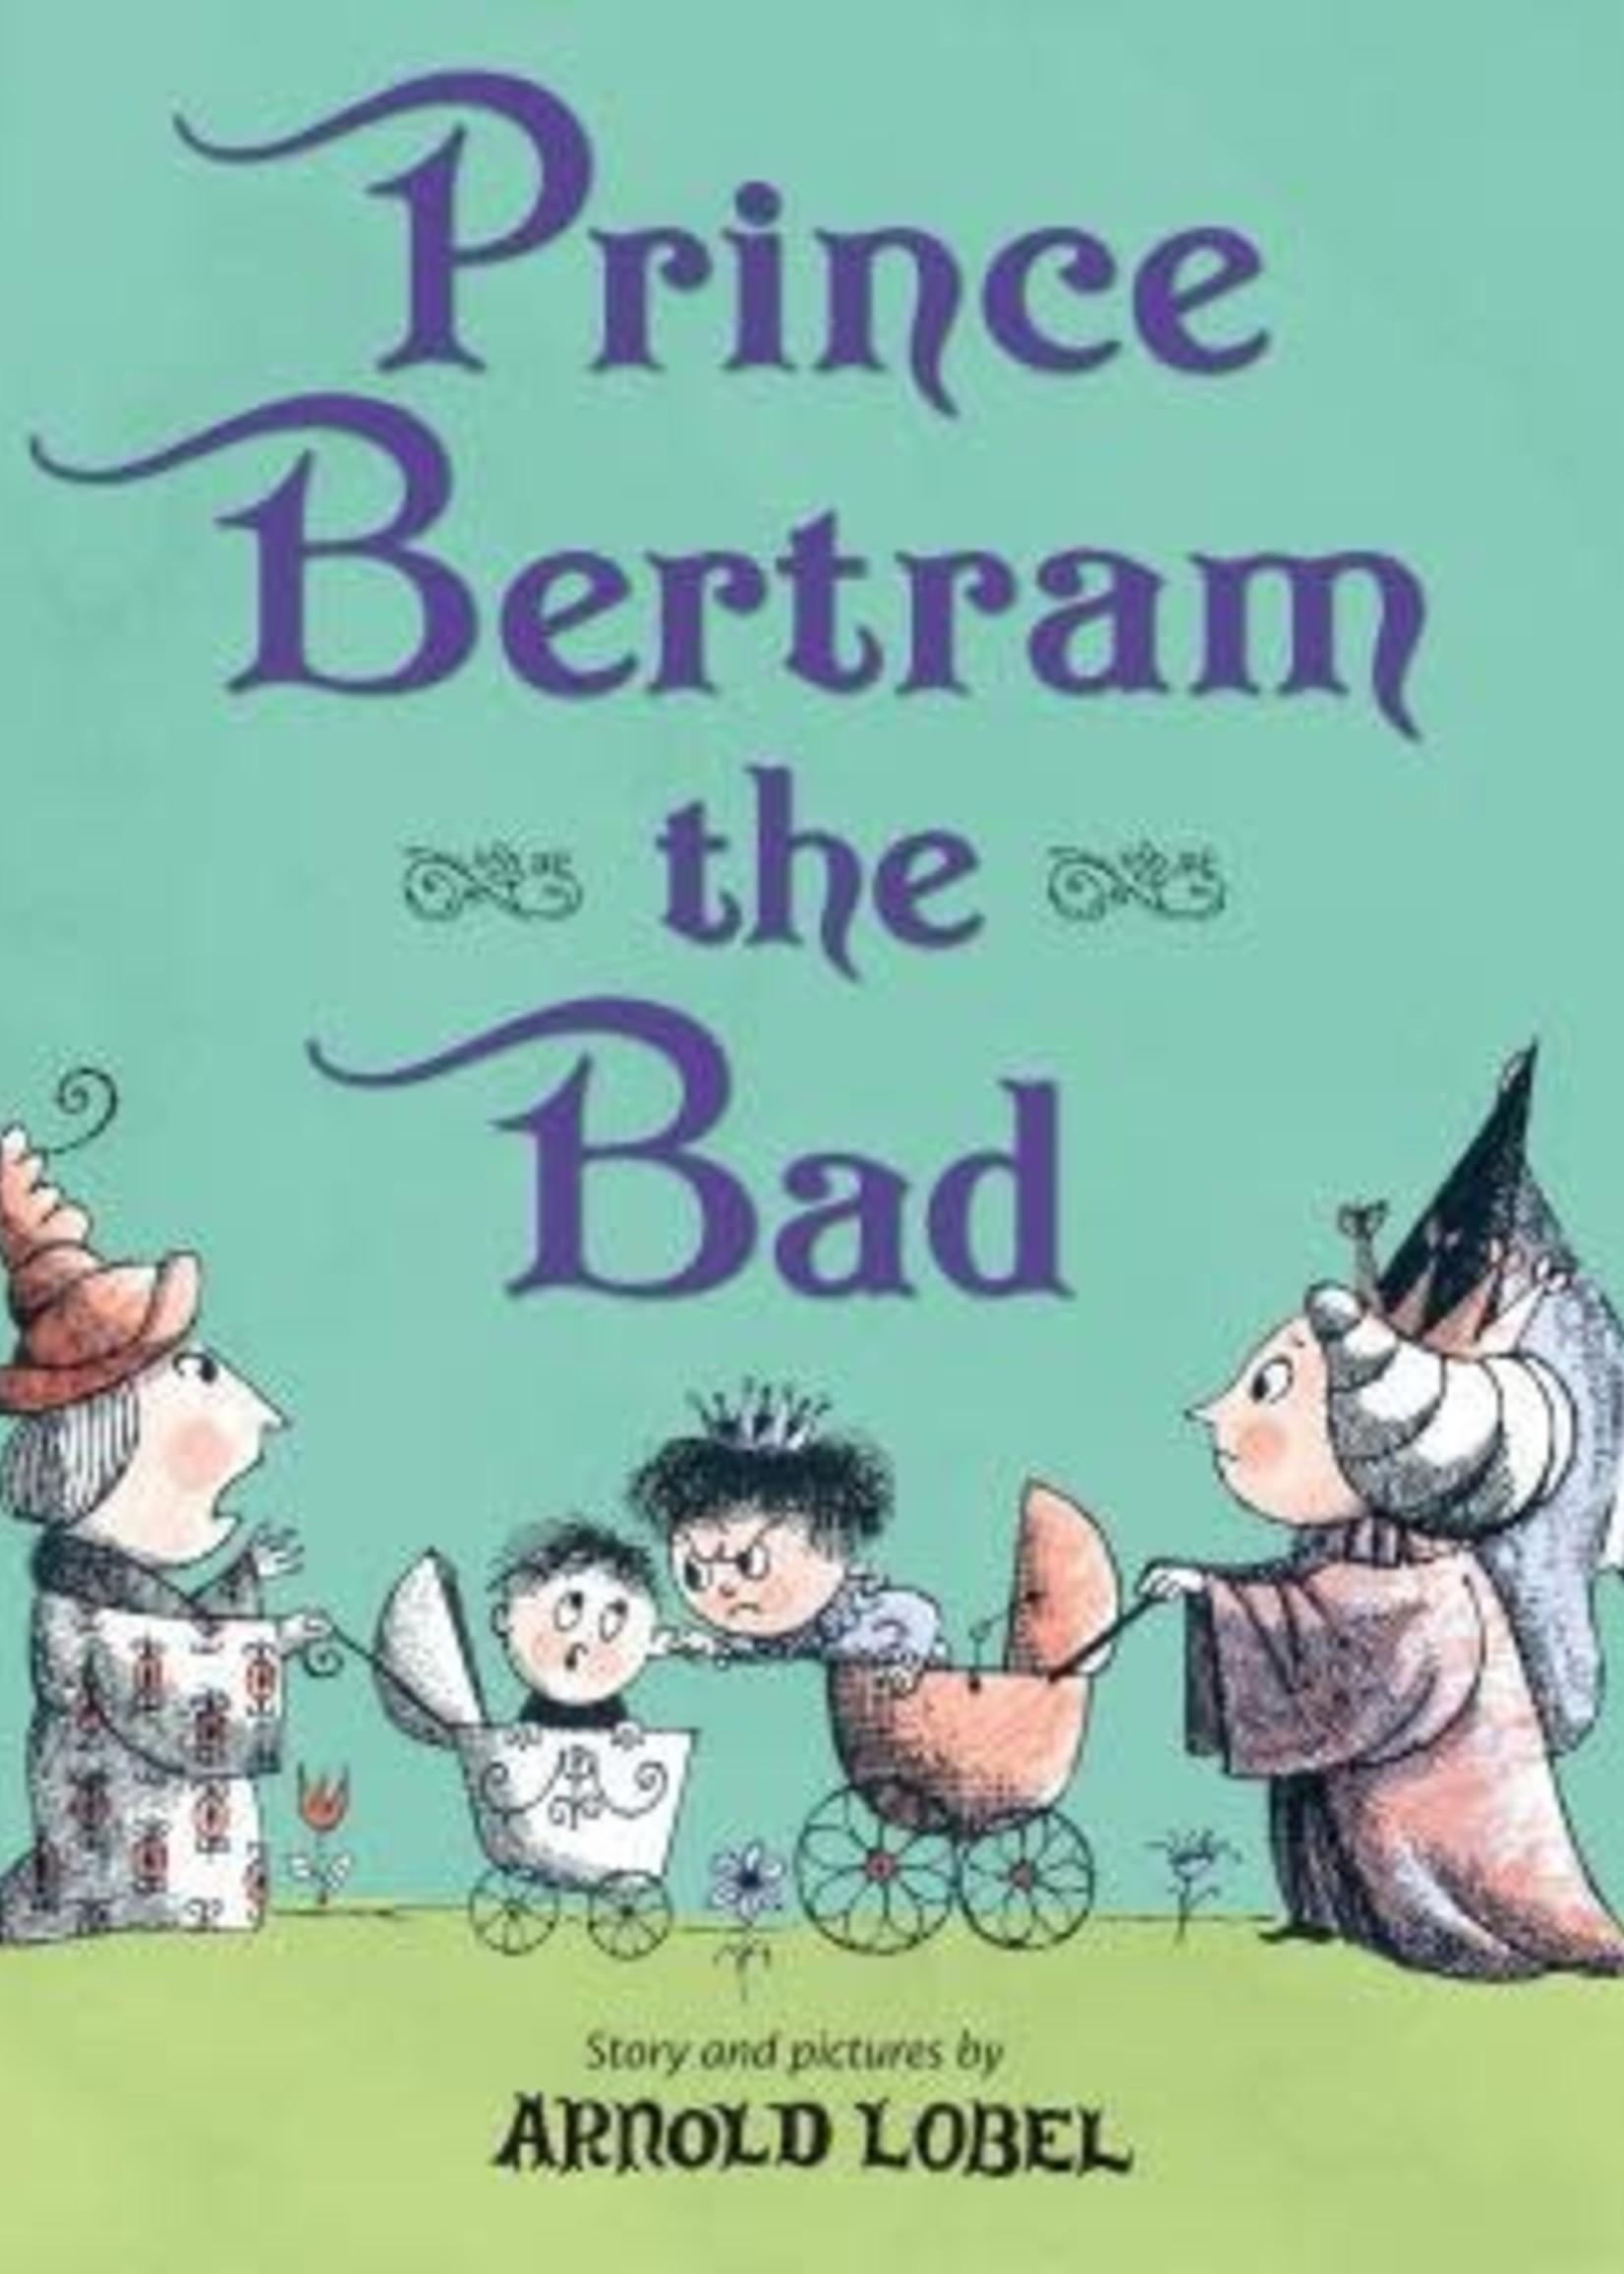 Prince Bertram the Bad by Arnold Lobel